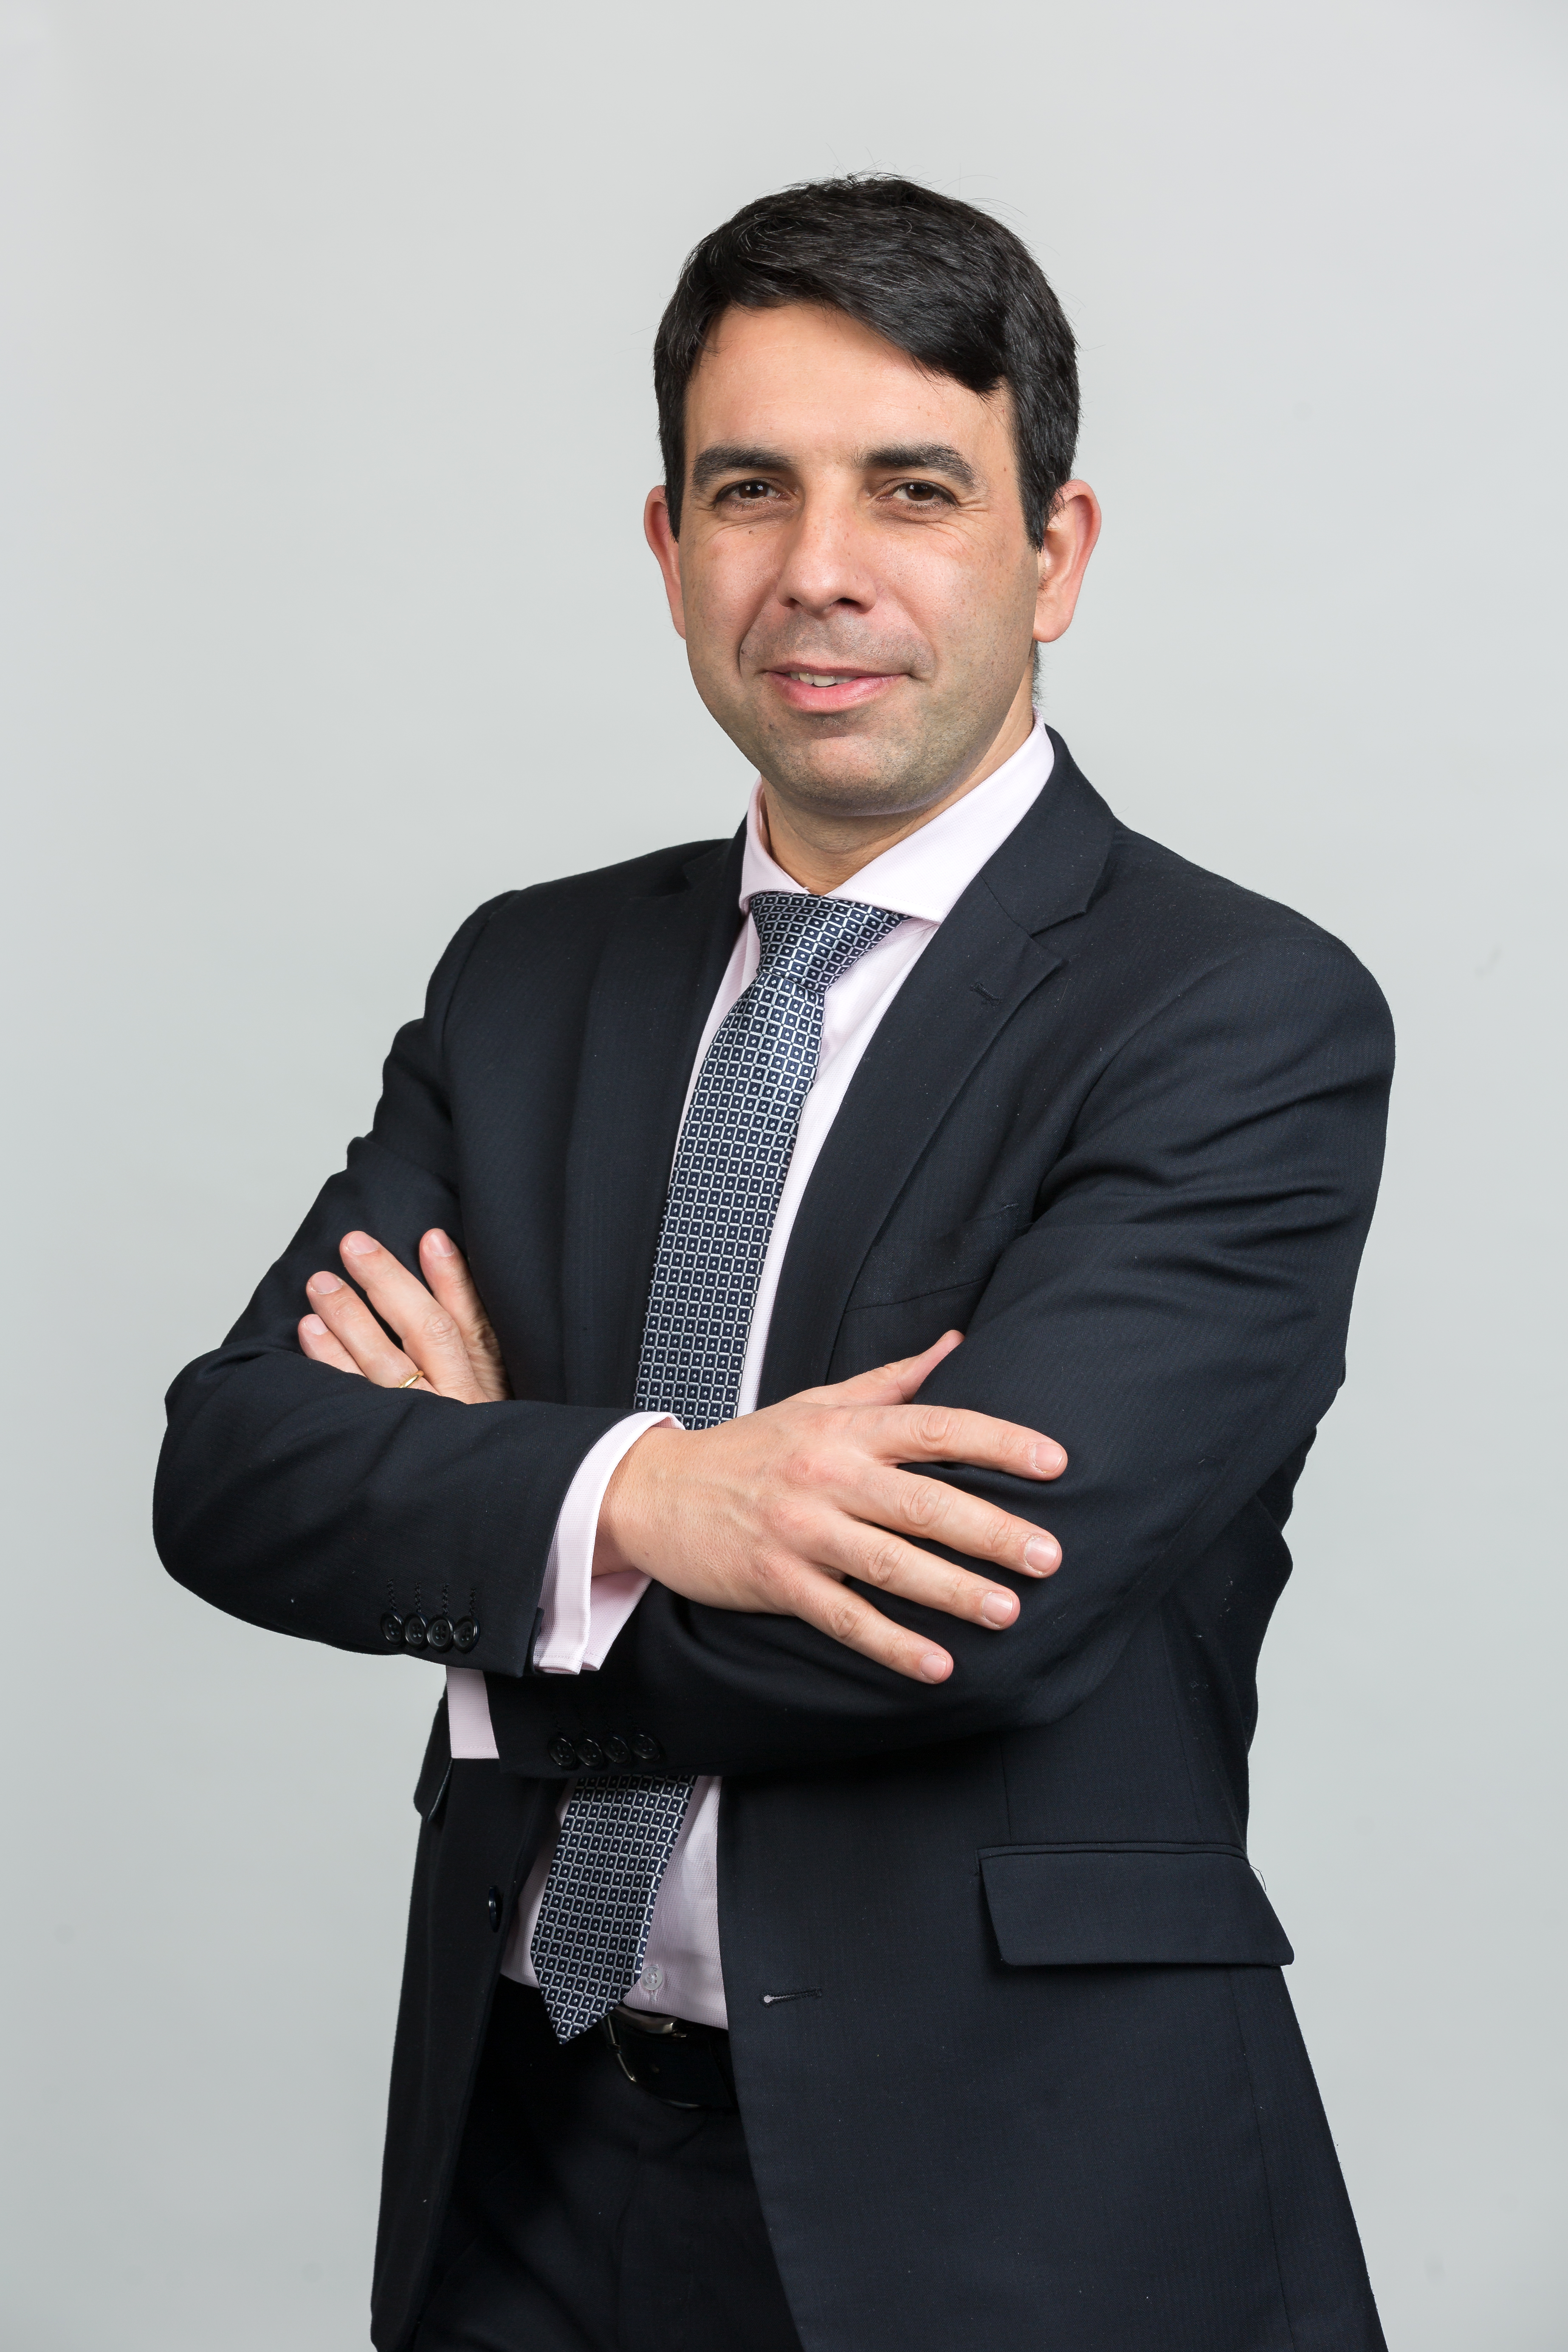 Joao Penedo